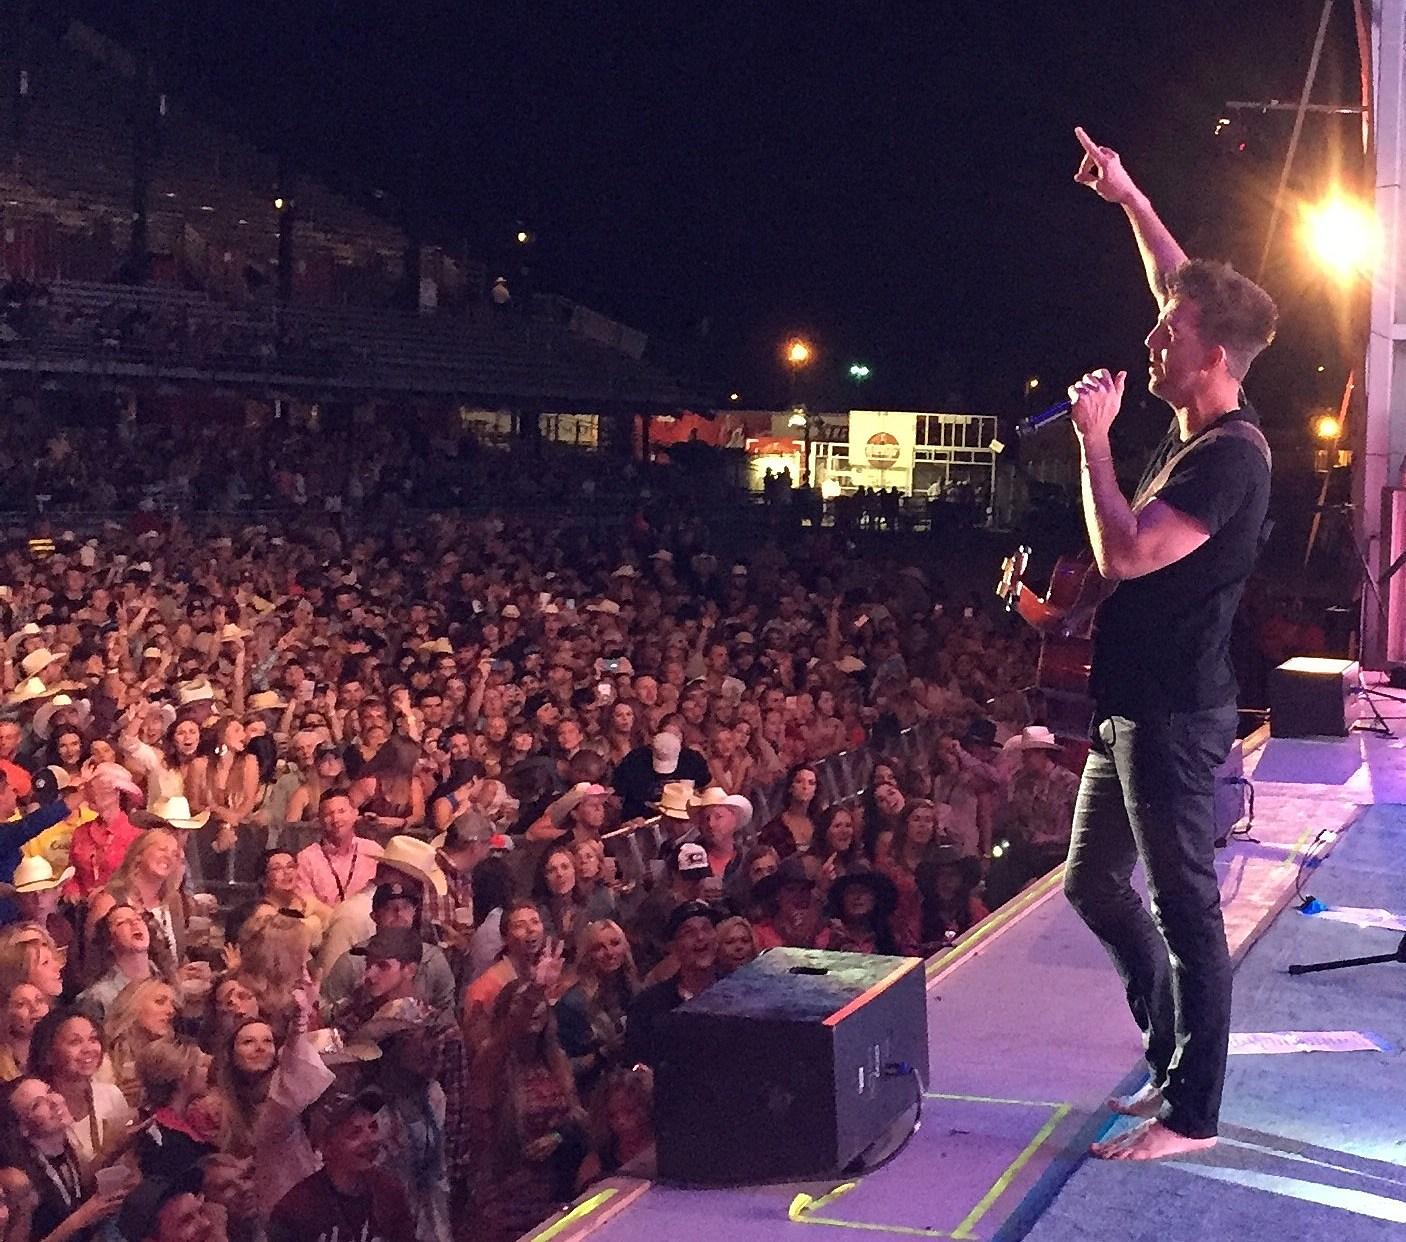 Jake Owen Performs at Cheyenne Frontier Days